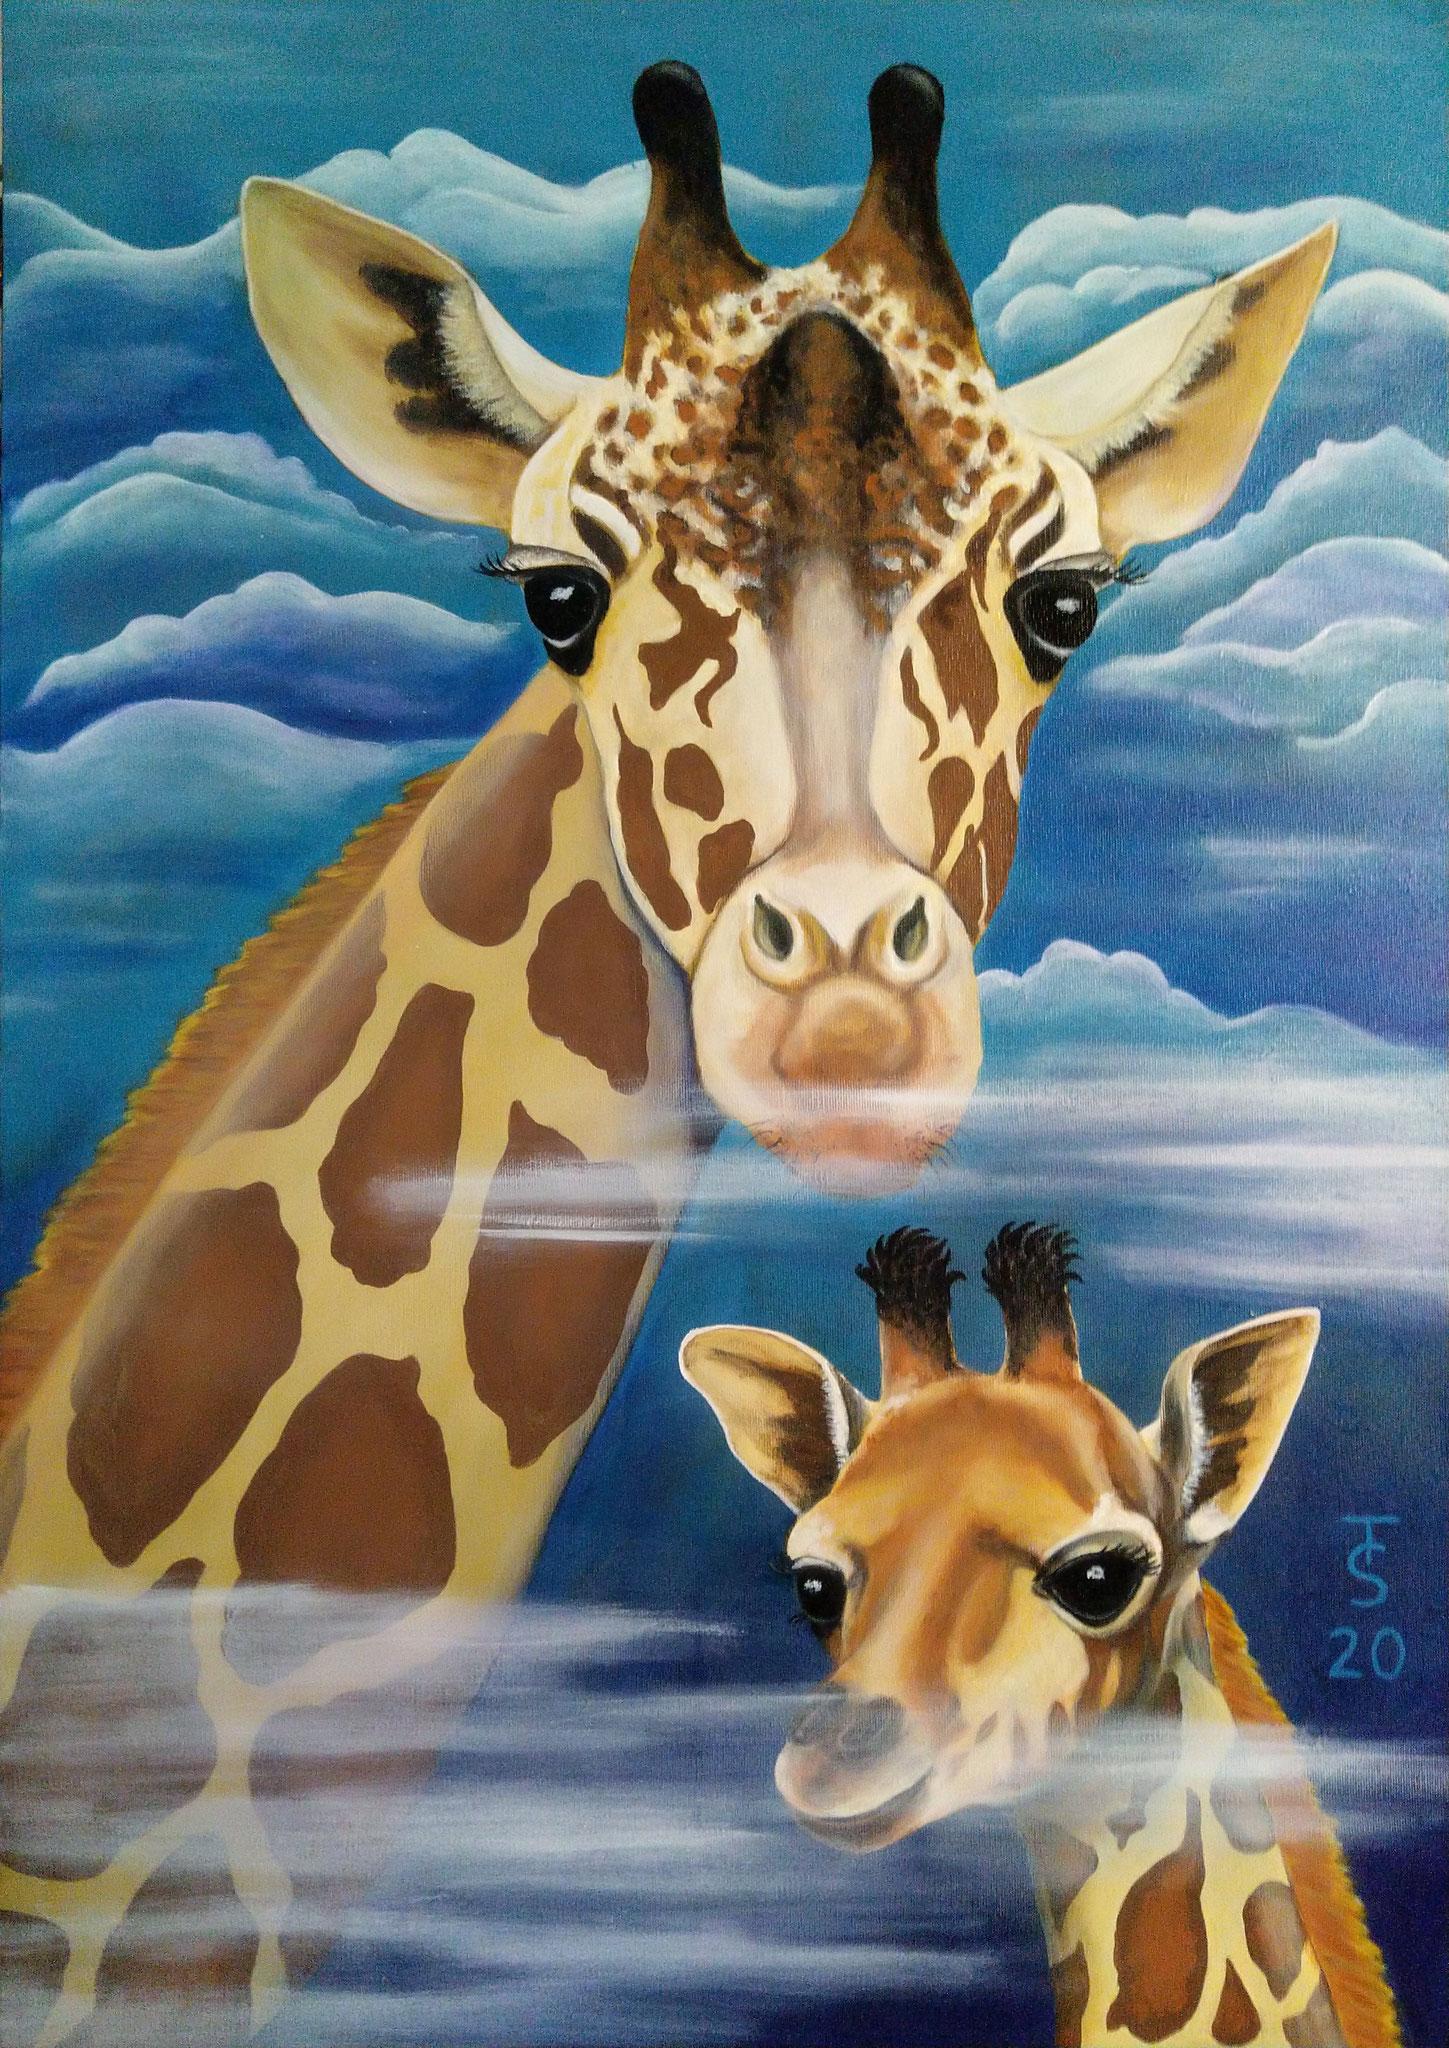 Giraffen-Weitblick _ (Acryl auf Leinwand, 70 x 100 cm)